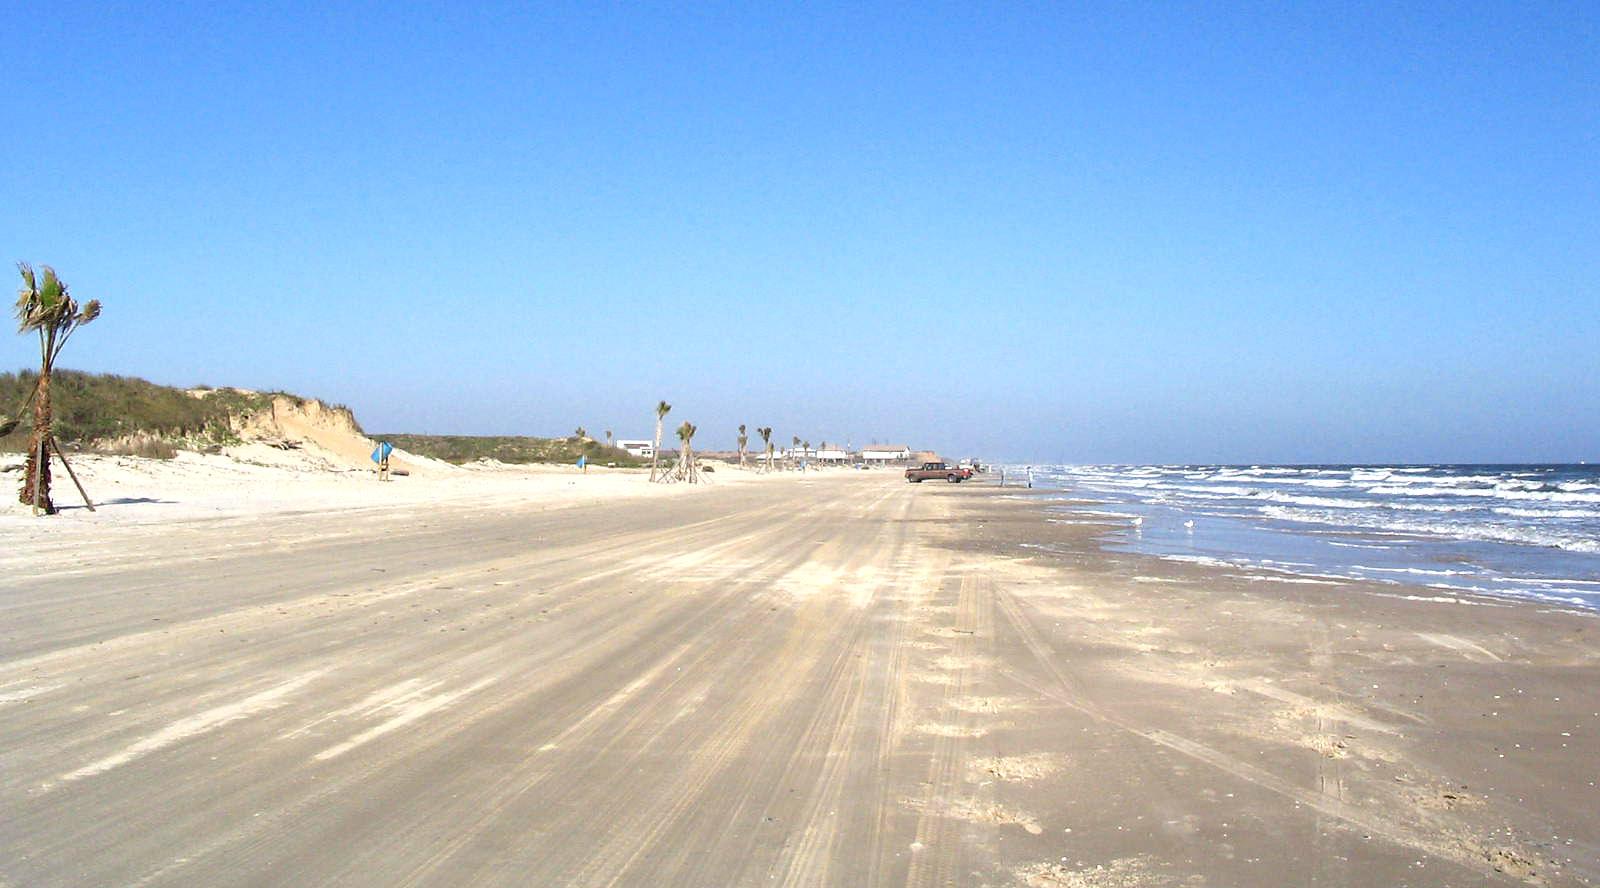 Freeport TX Quintana Beach County Park Images